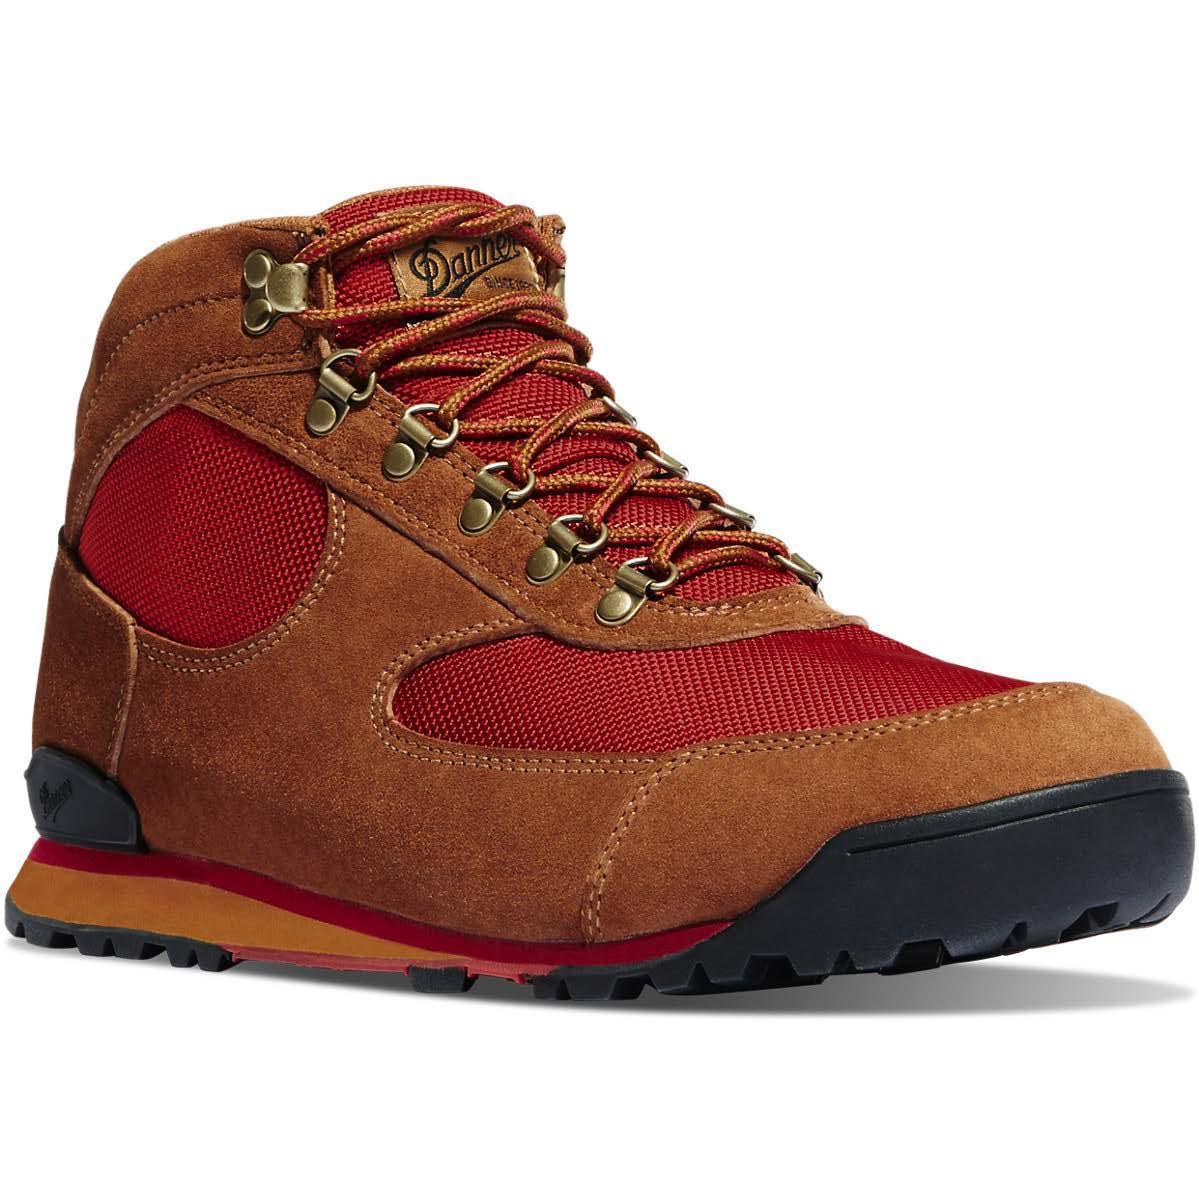 5f7ce031842 Danner Men's Jag Major Brown/Bossa Nova Outdoor Boot Style No. 37392